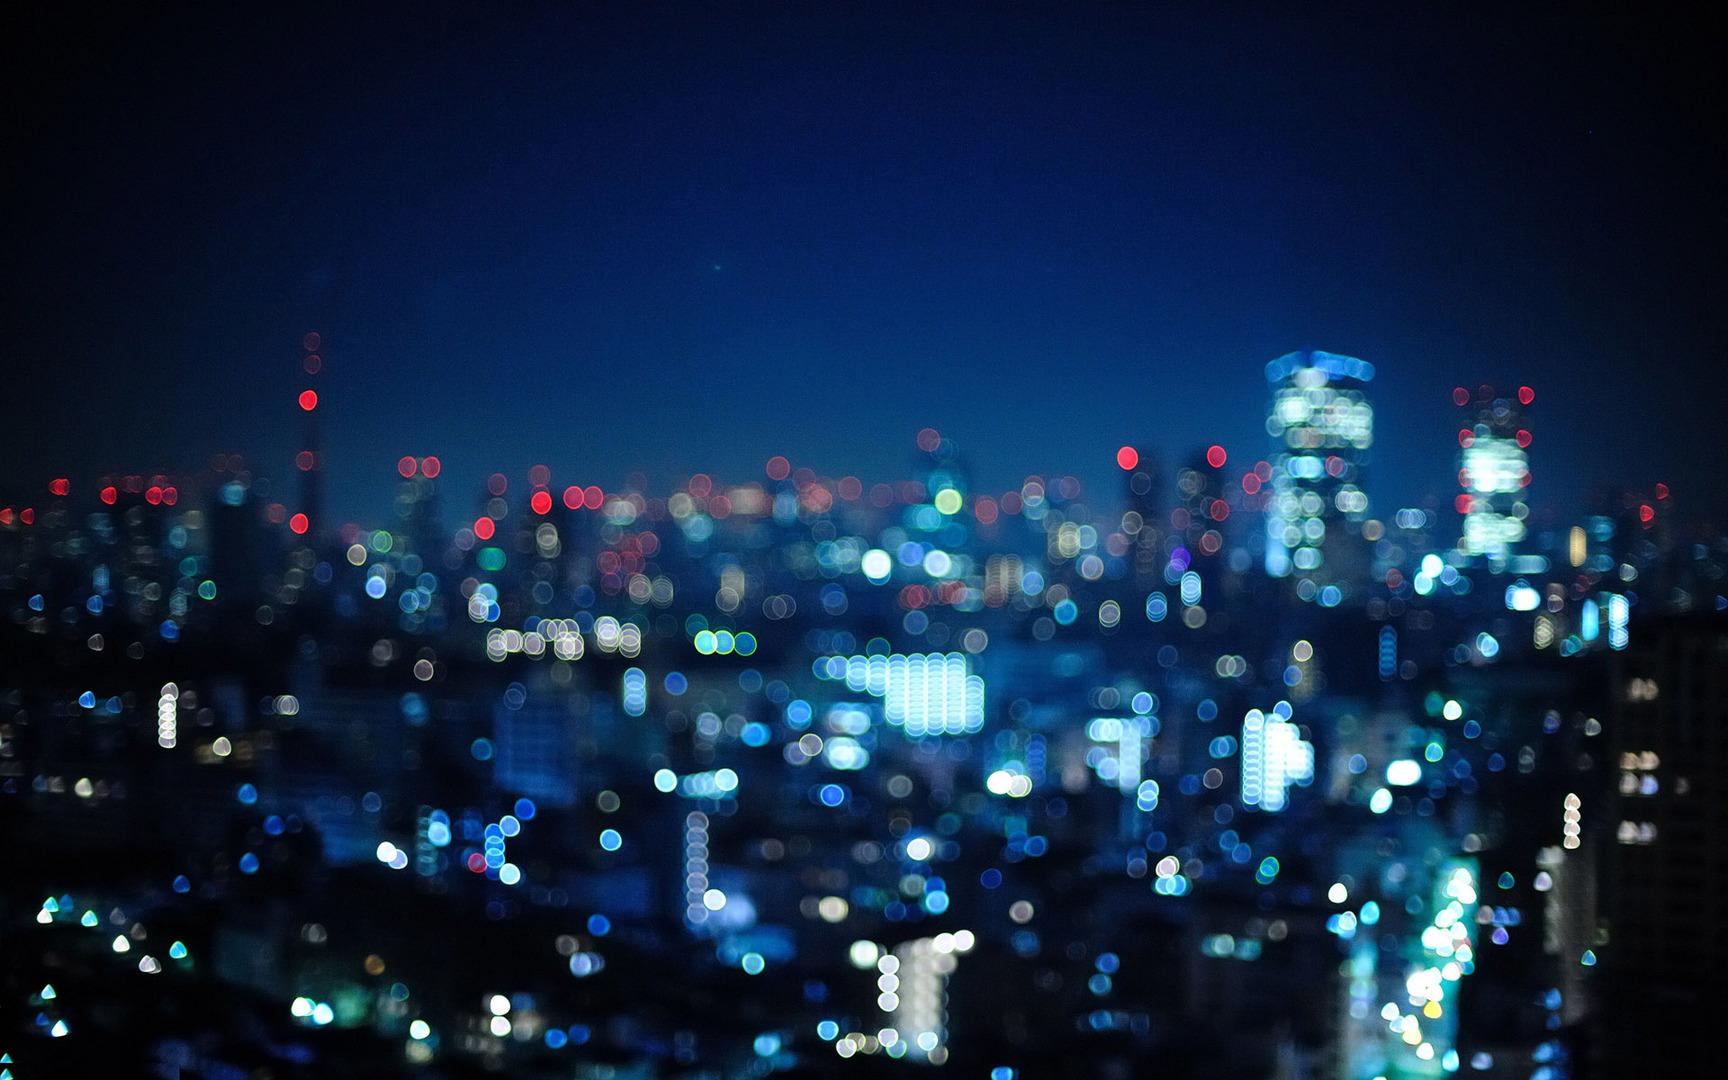 Download Blurry city lights wallpaper 1728x1080